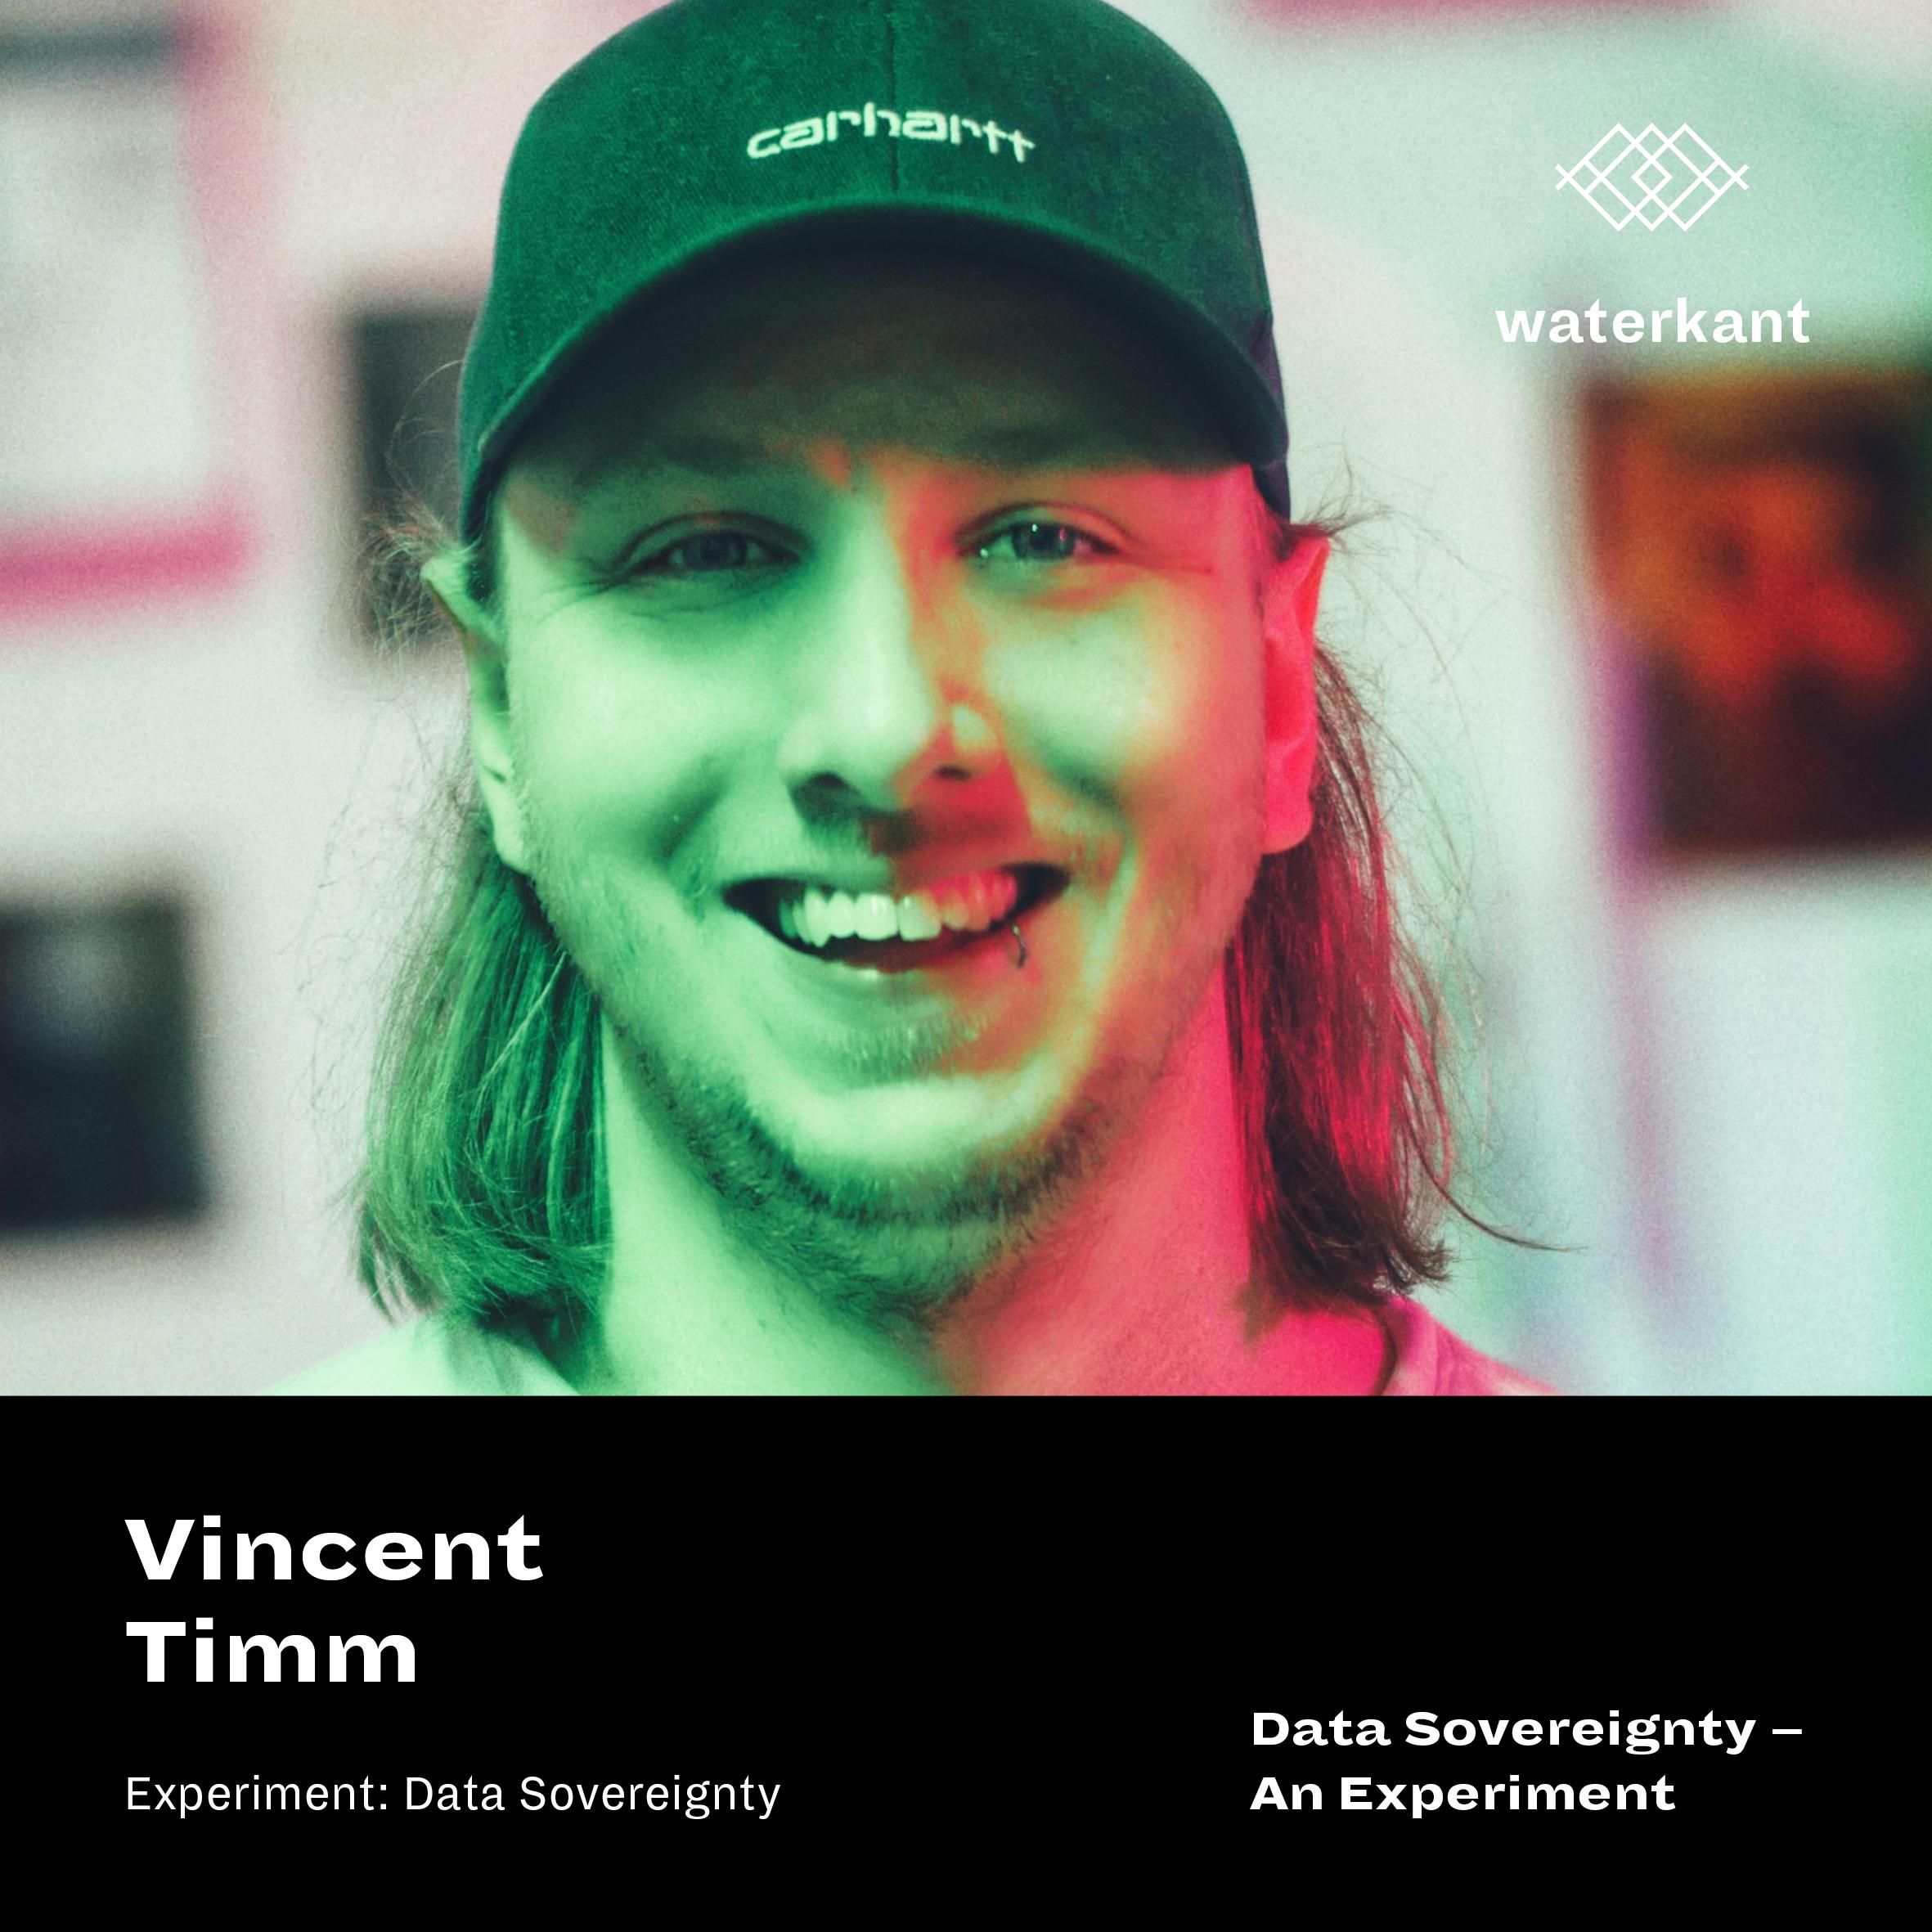 Vincent Timm